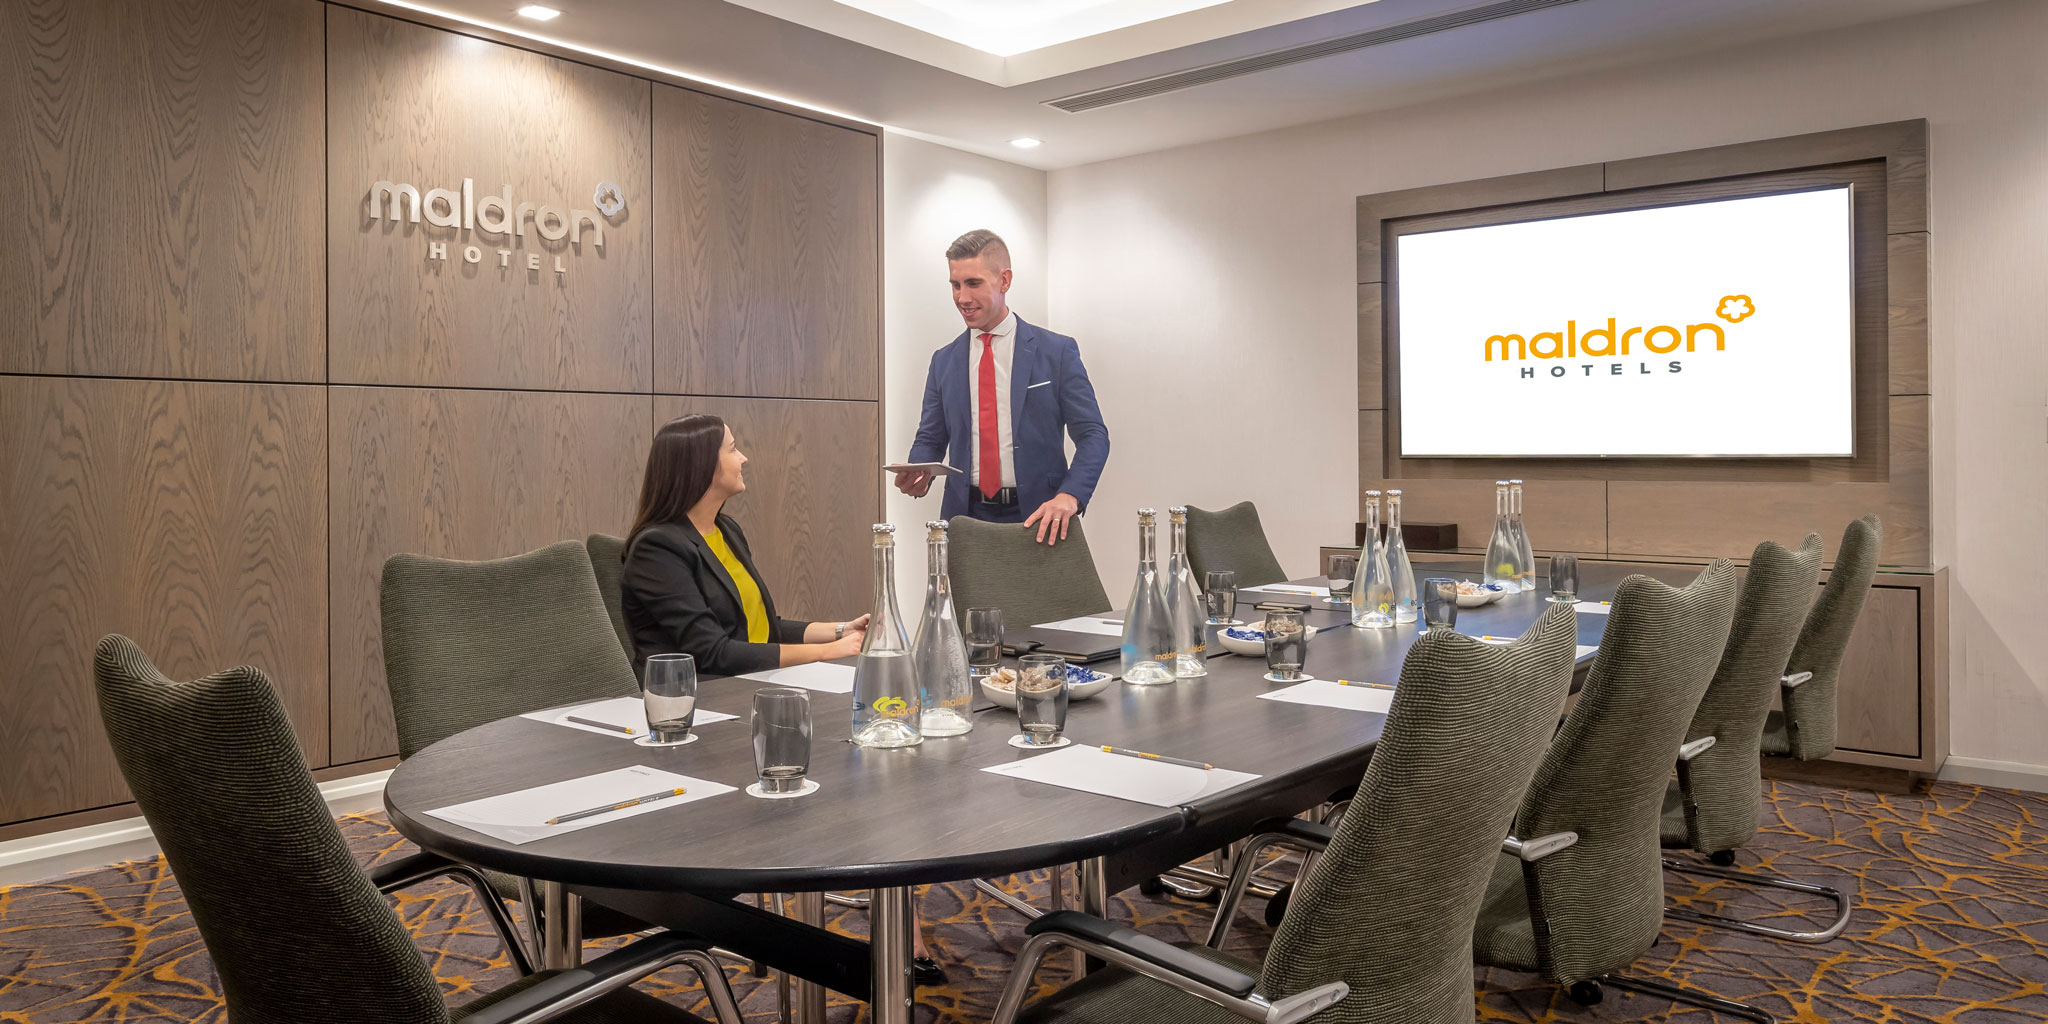 Boardroom-meetings-Maldron